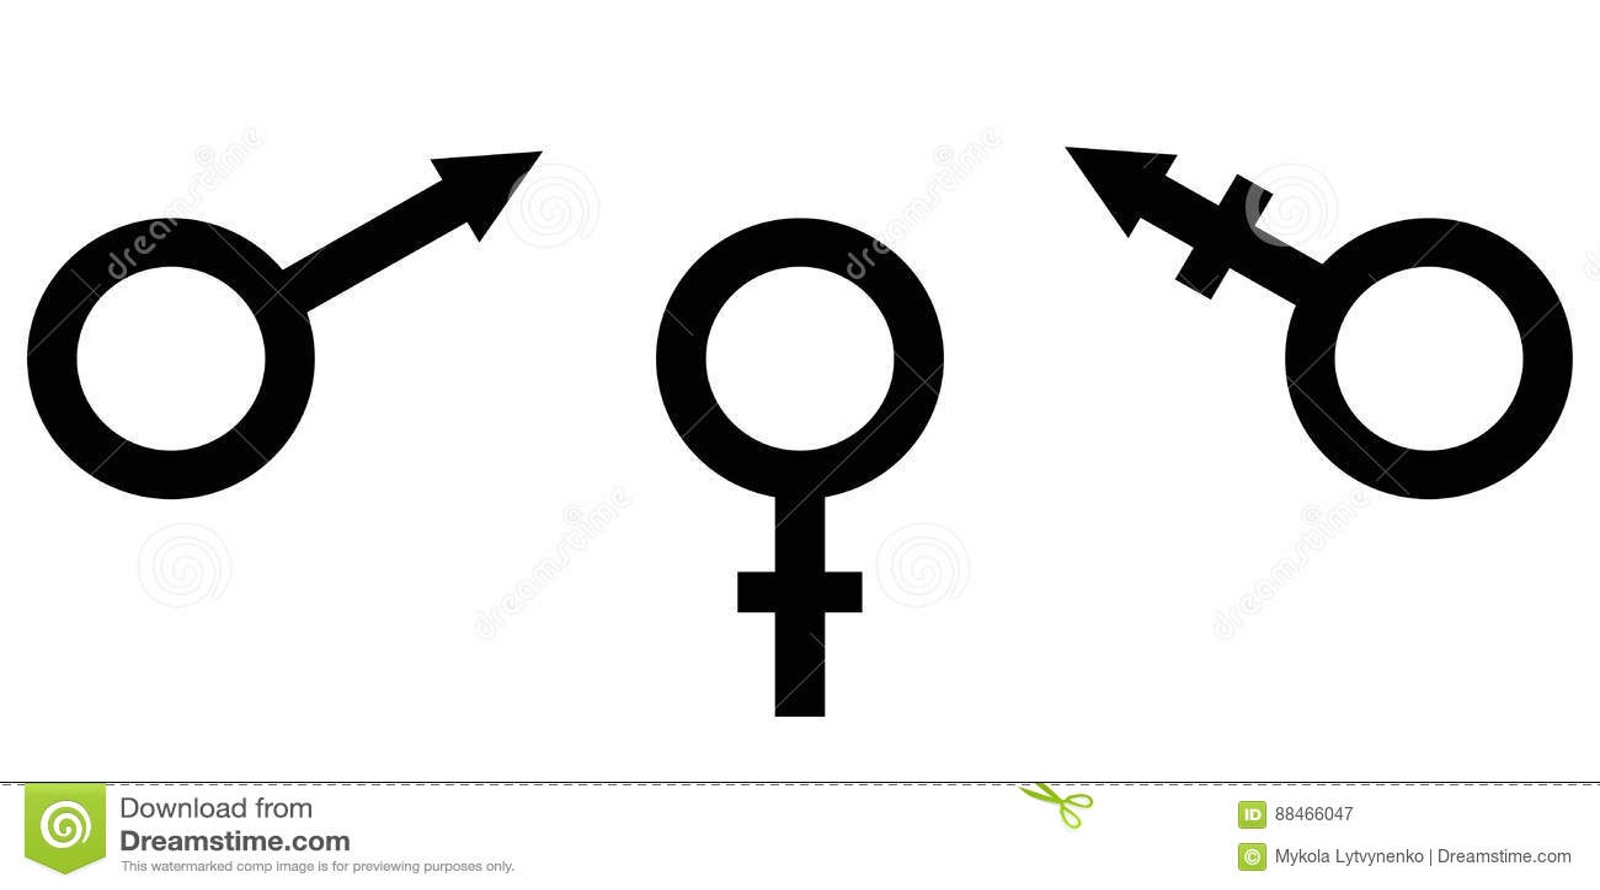 from Makai equal rights transgender